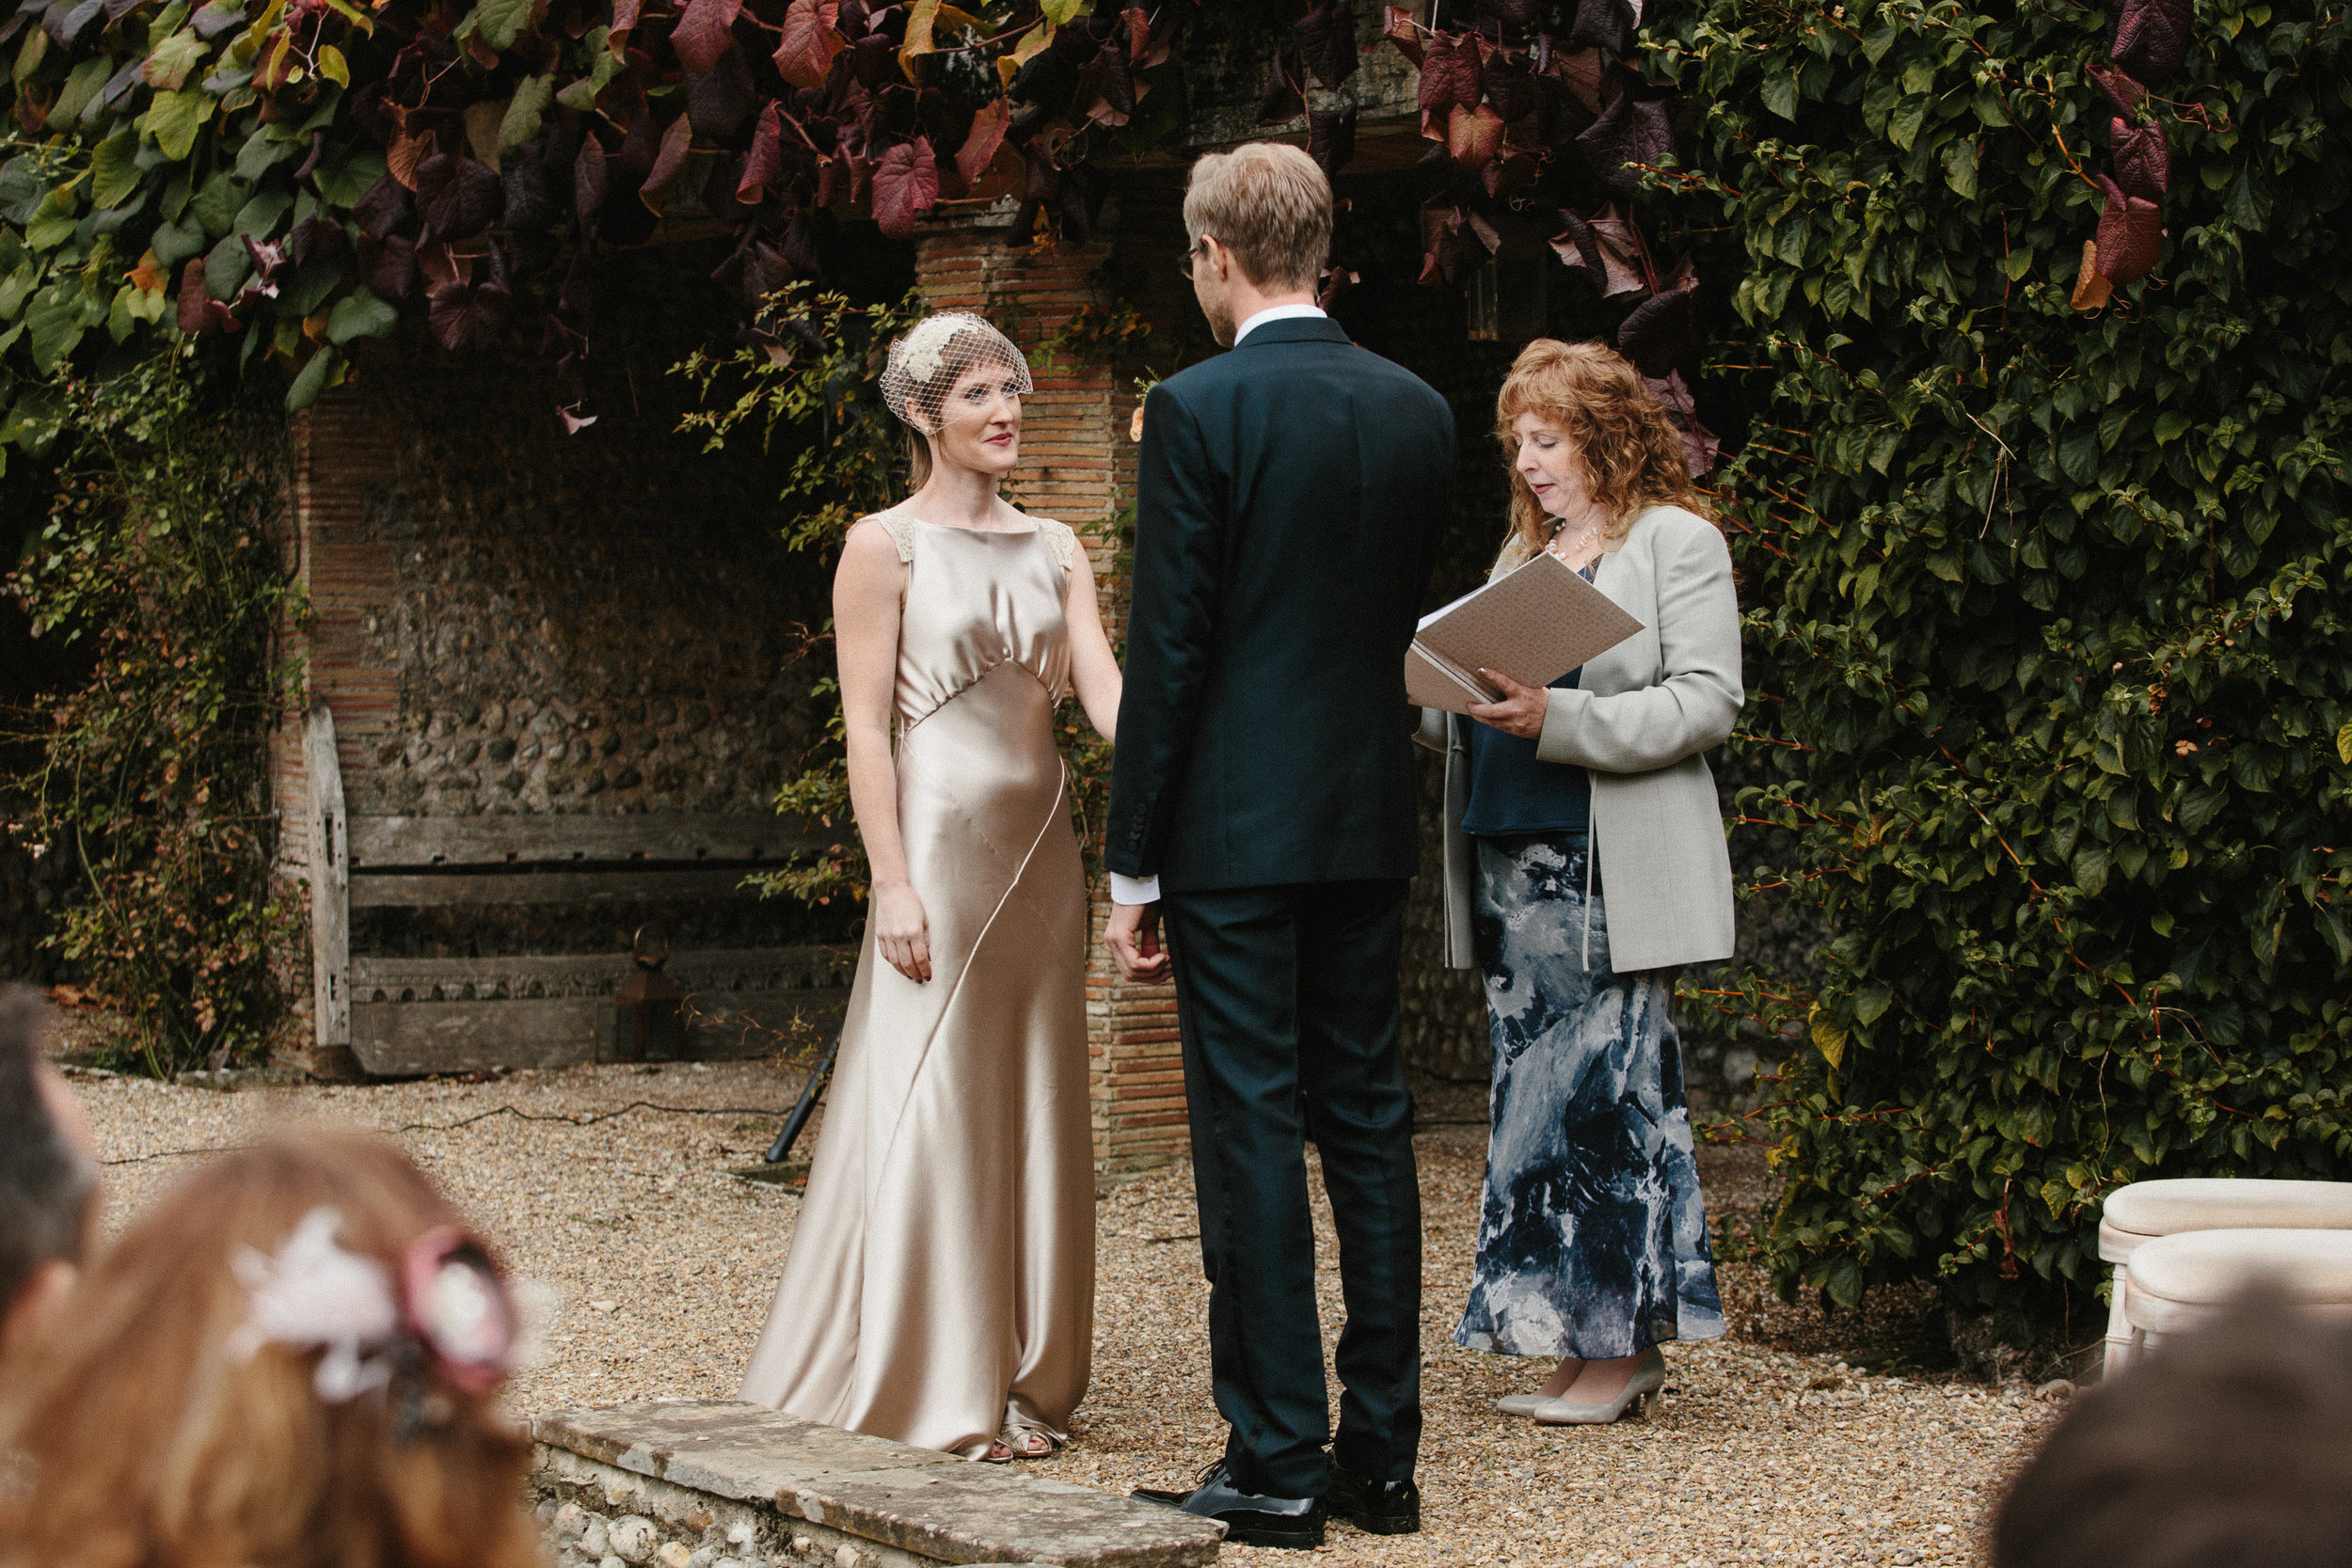 Kate-Beaumont-Sheffield-Honeysuckle-bias-cut-wedding-dress-oyster-Rosie6.jpg